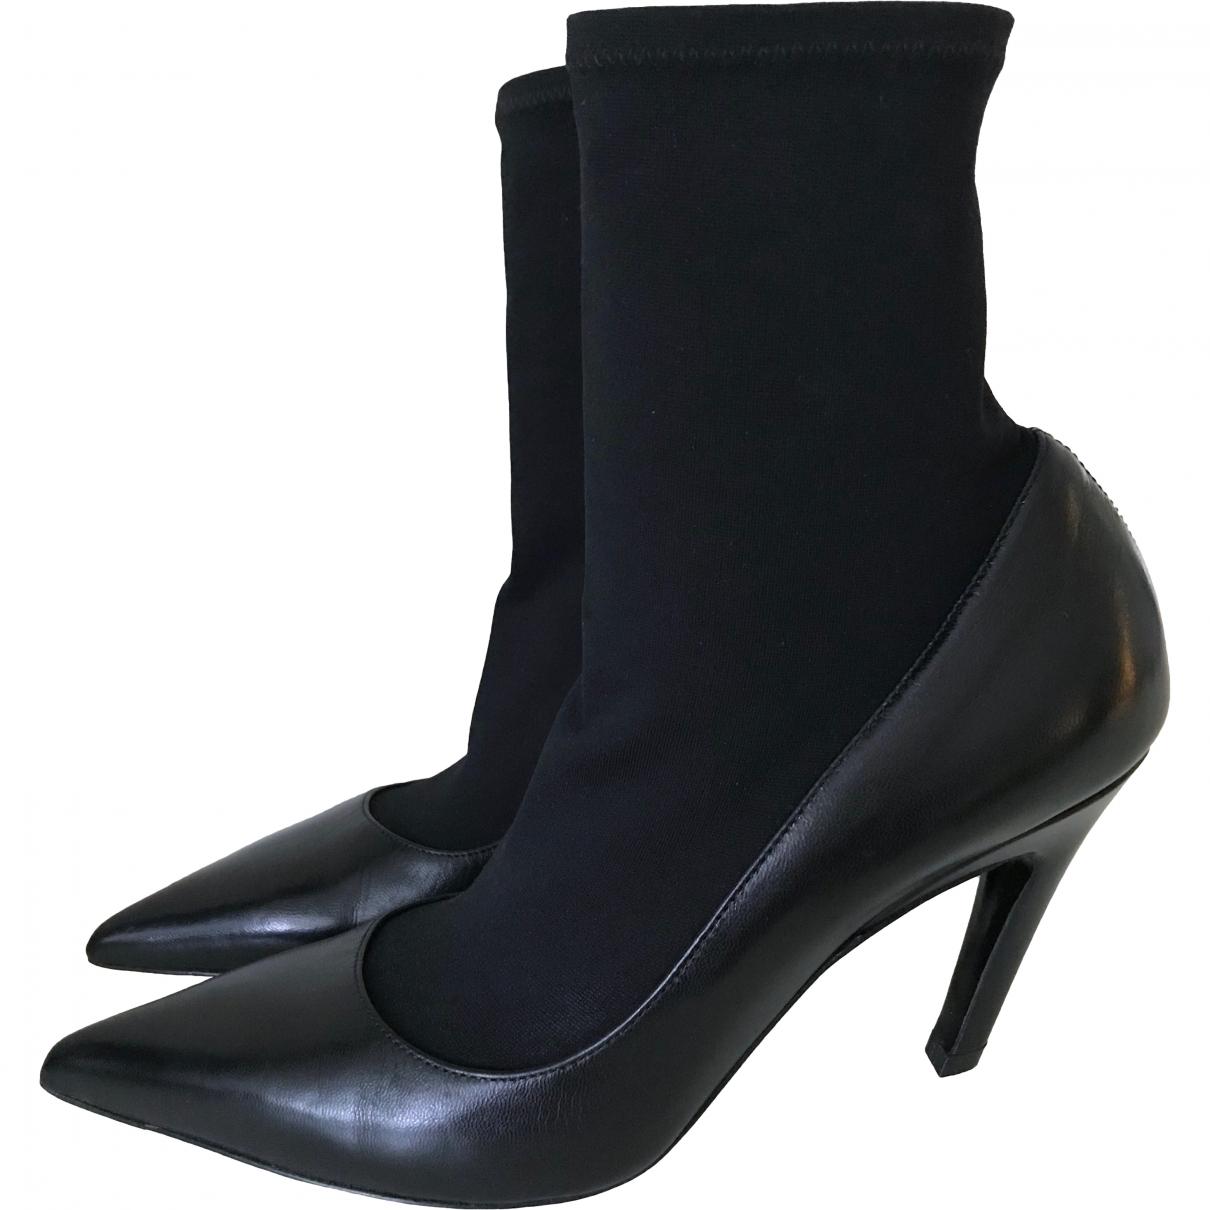 Balenciaga Knife Black Leather Ankle boots for Women 35 EU